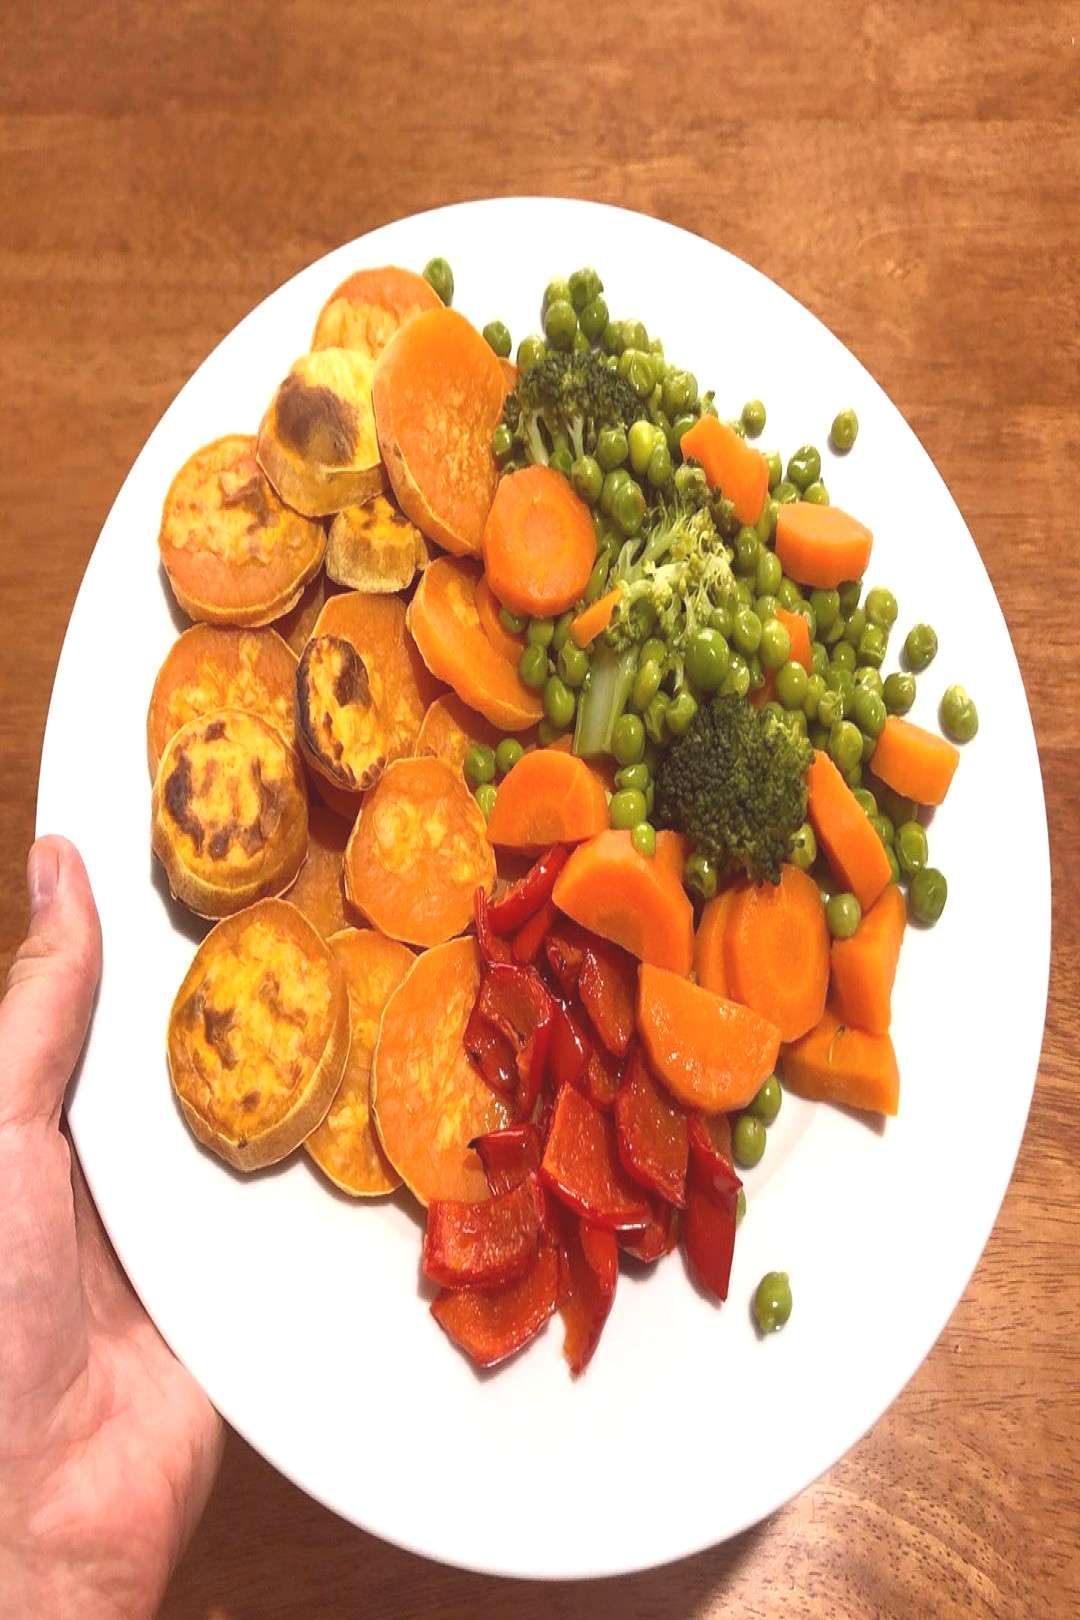 #capsicums #roasted #veggies #dinner #potato #baked #sweet #food #and #red DINNER!! Baked sweet potato , veggies and roasted red capsicums .You can find Vegan dinner and more on our website.DINNER!! Baked sweet potato , veggies and roaste...